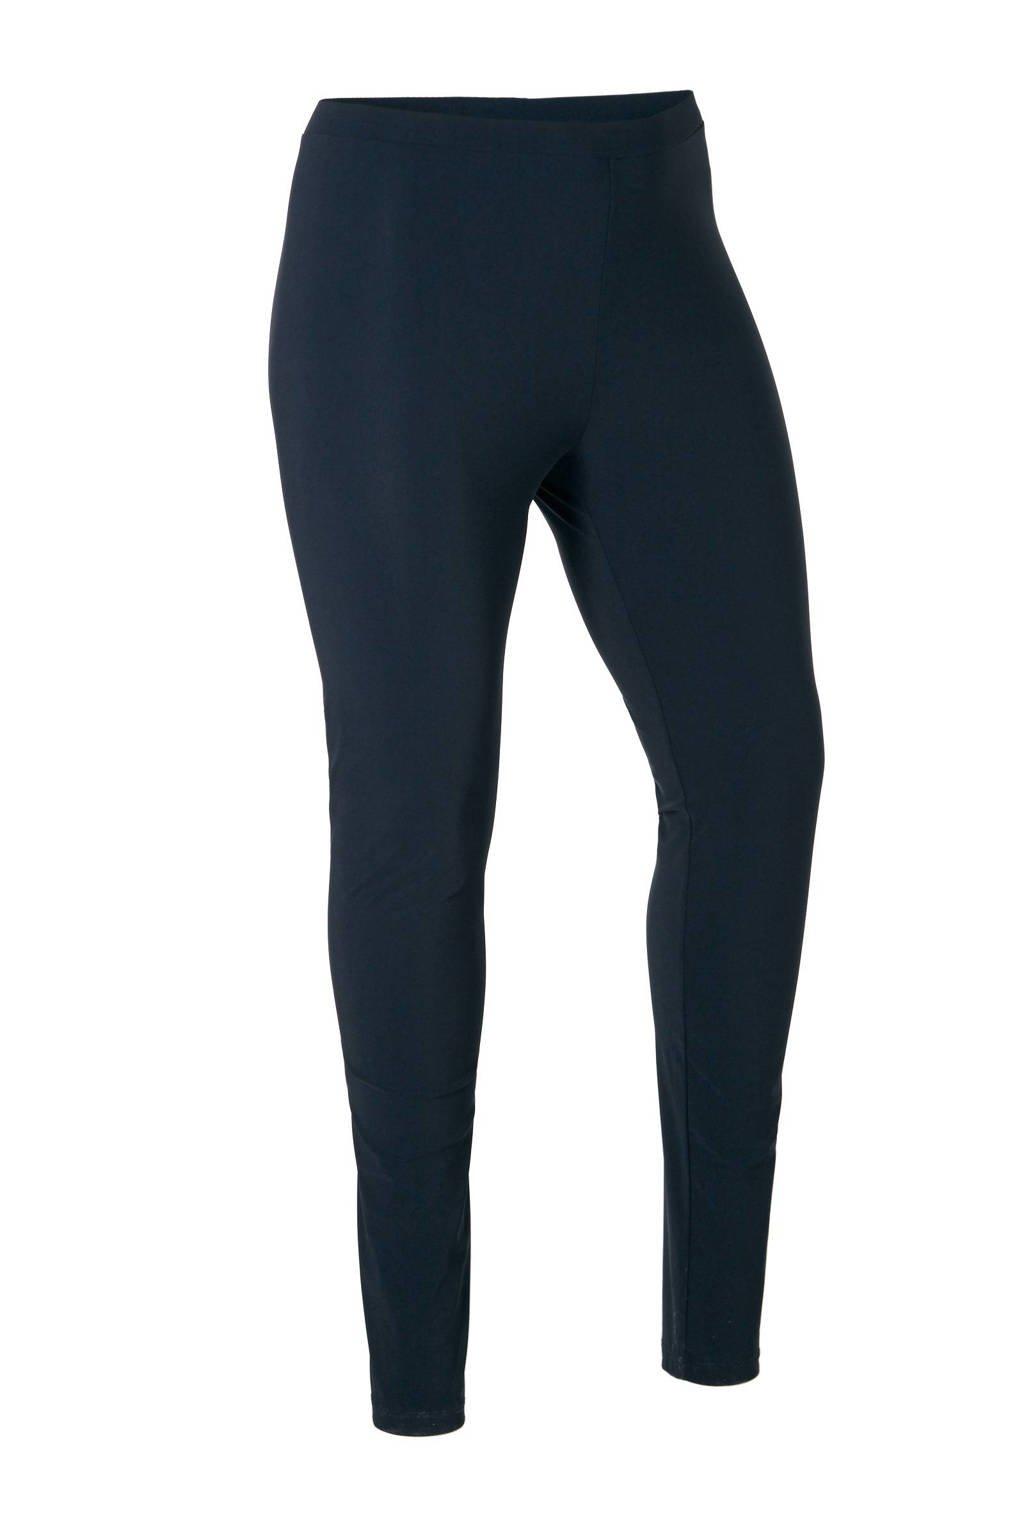 Plus Basics slim fit legging van travelstof donkerblauw, Donkerblauw